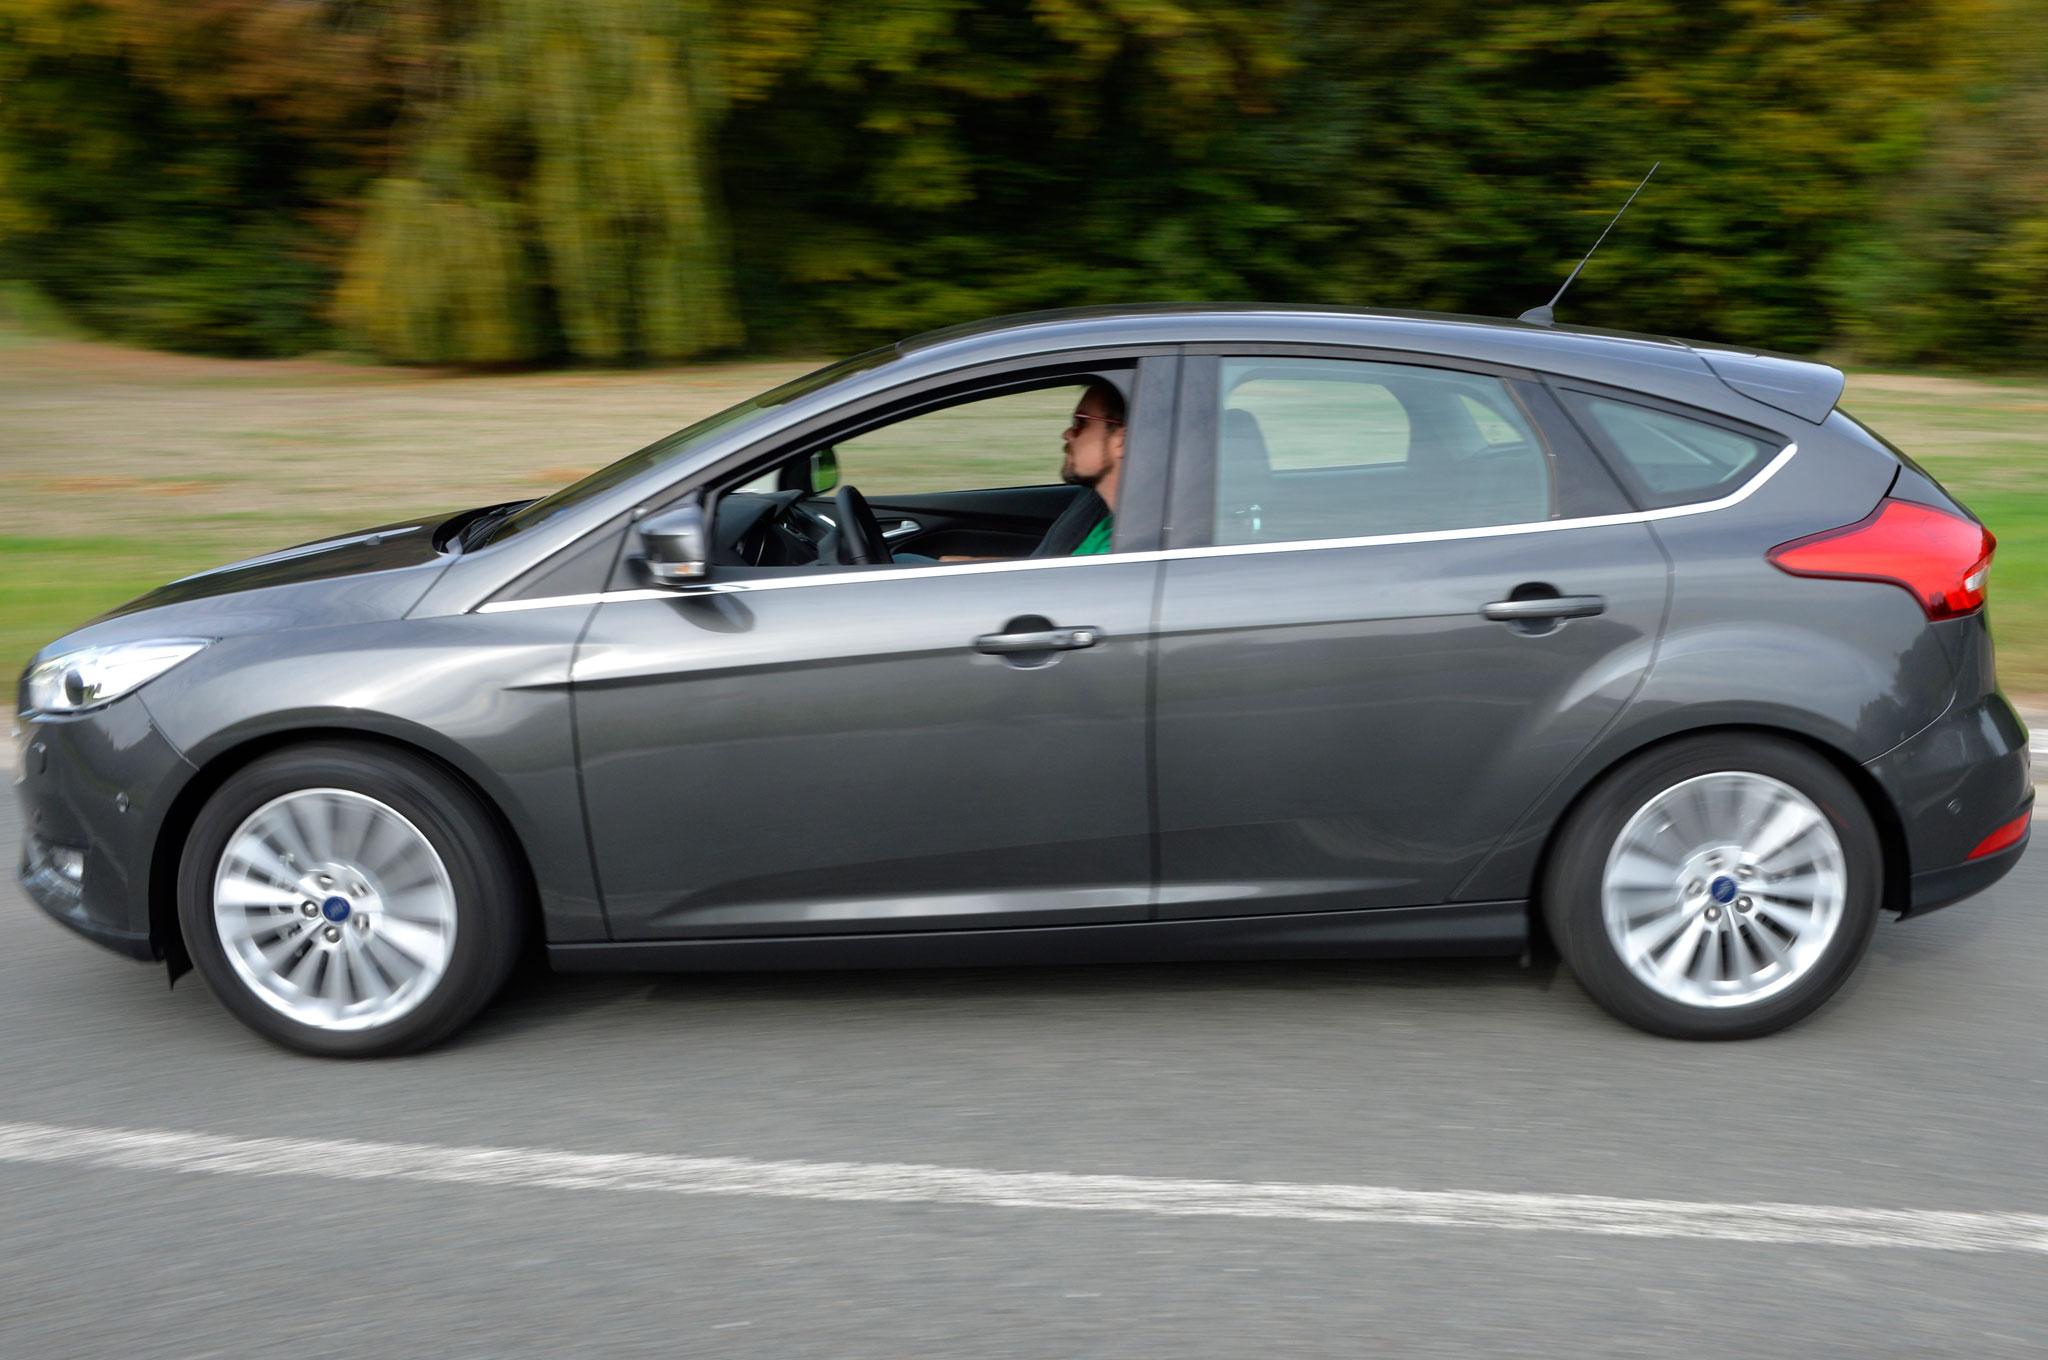 focus back hatchback massive in conti performance rs pressebild blau a ford topic